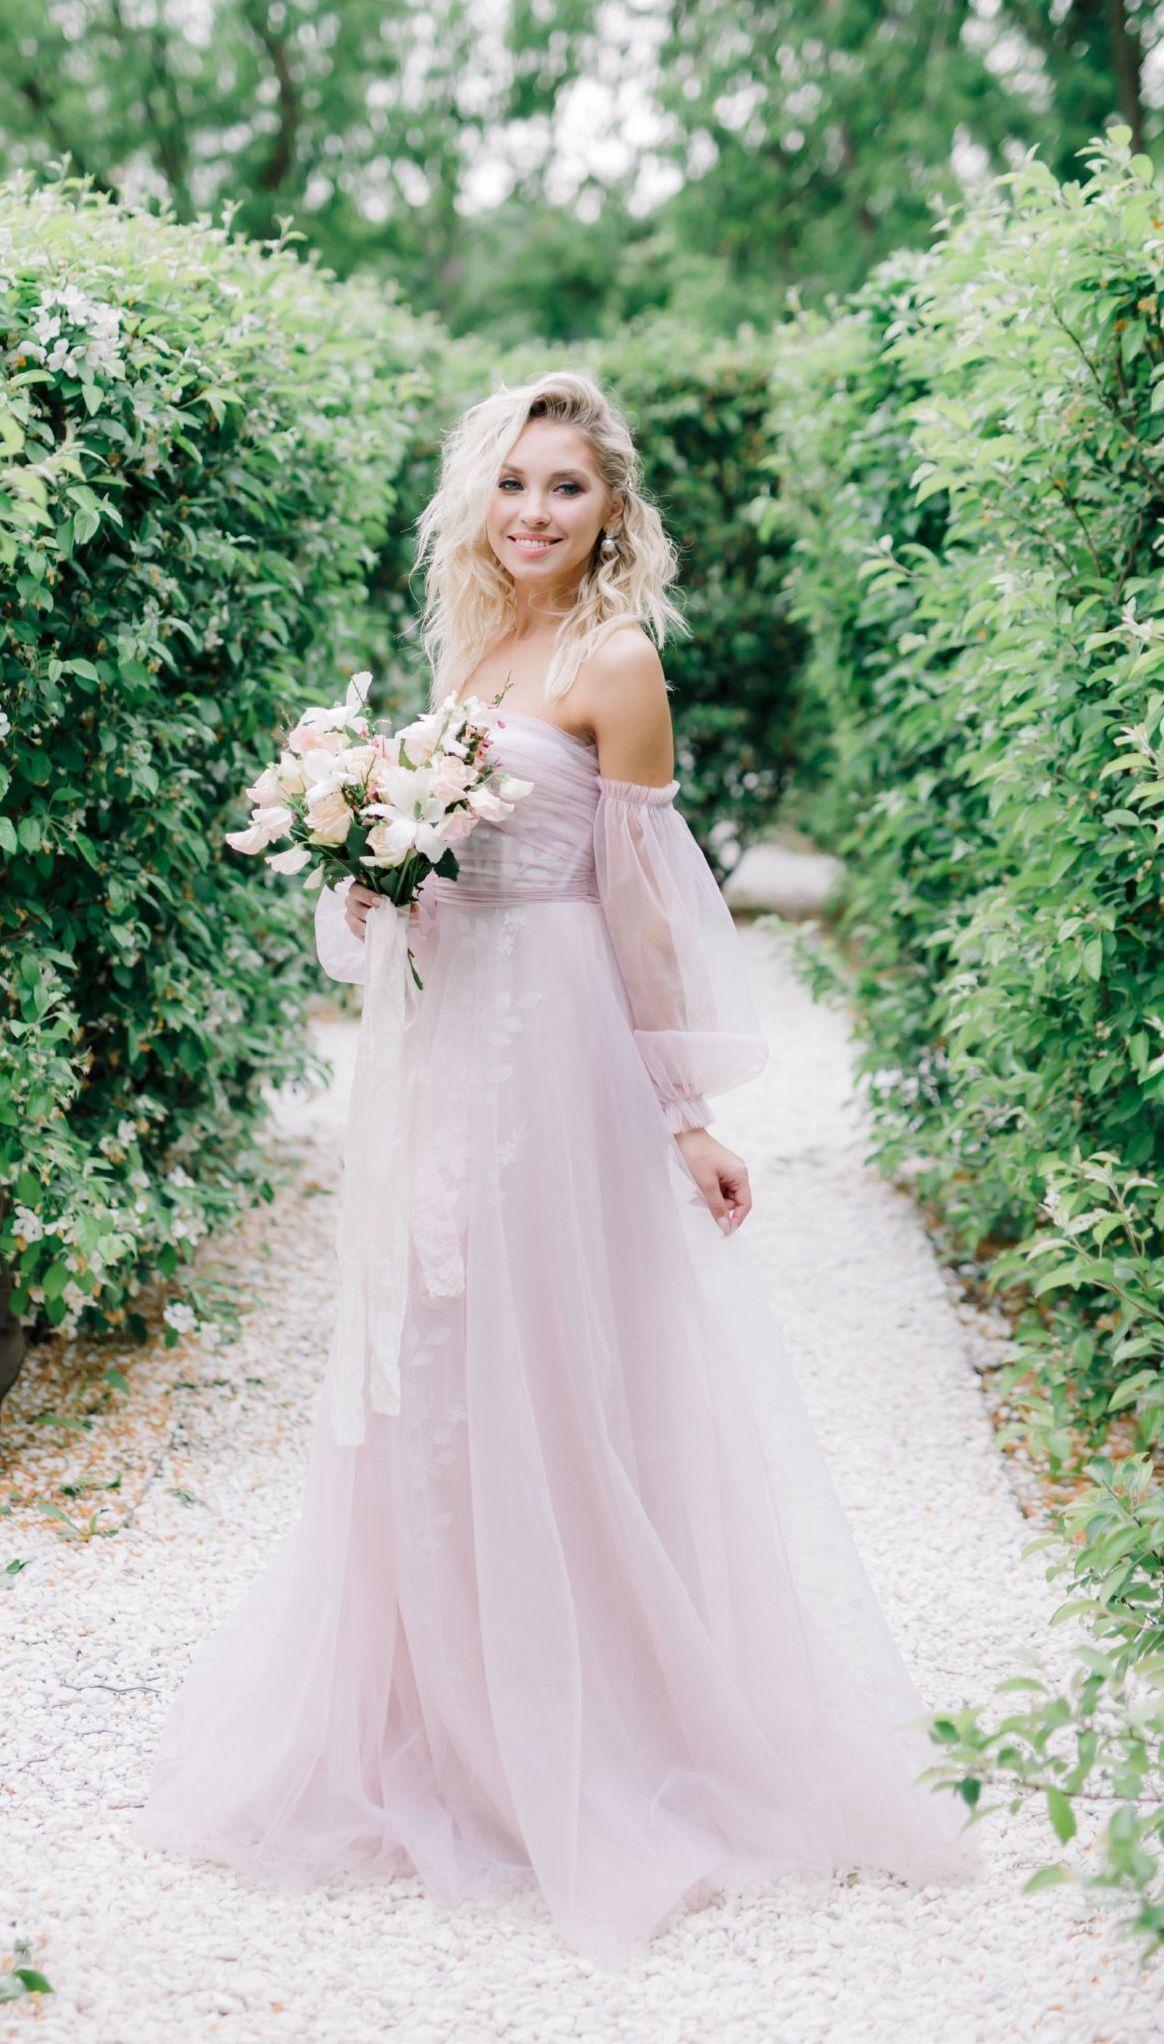 Blush pink wedding dress by dreamdress bohemian off